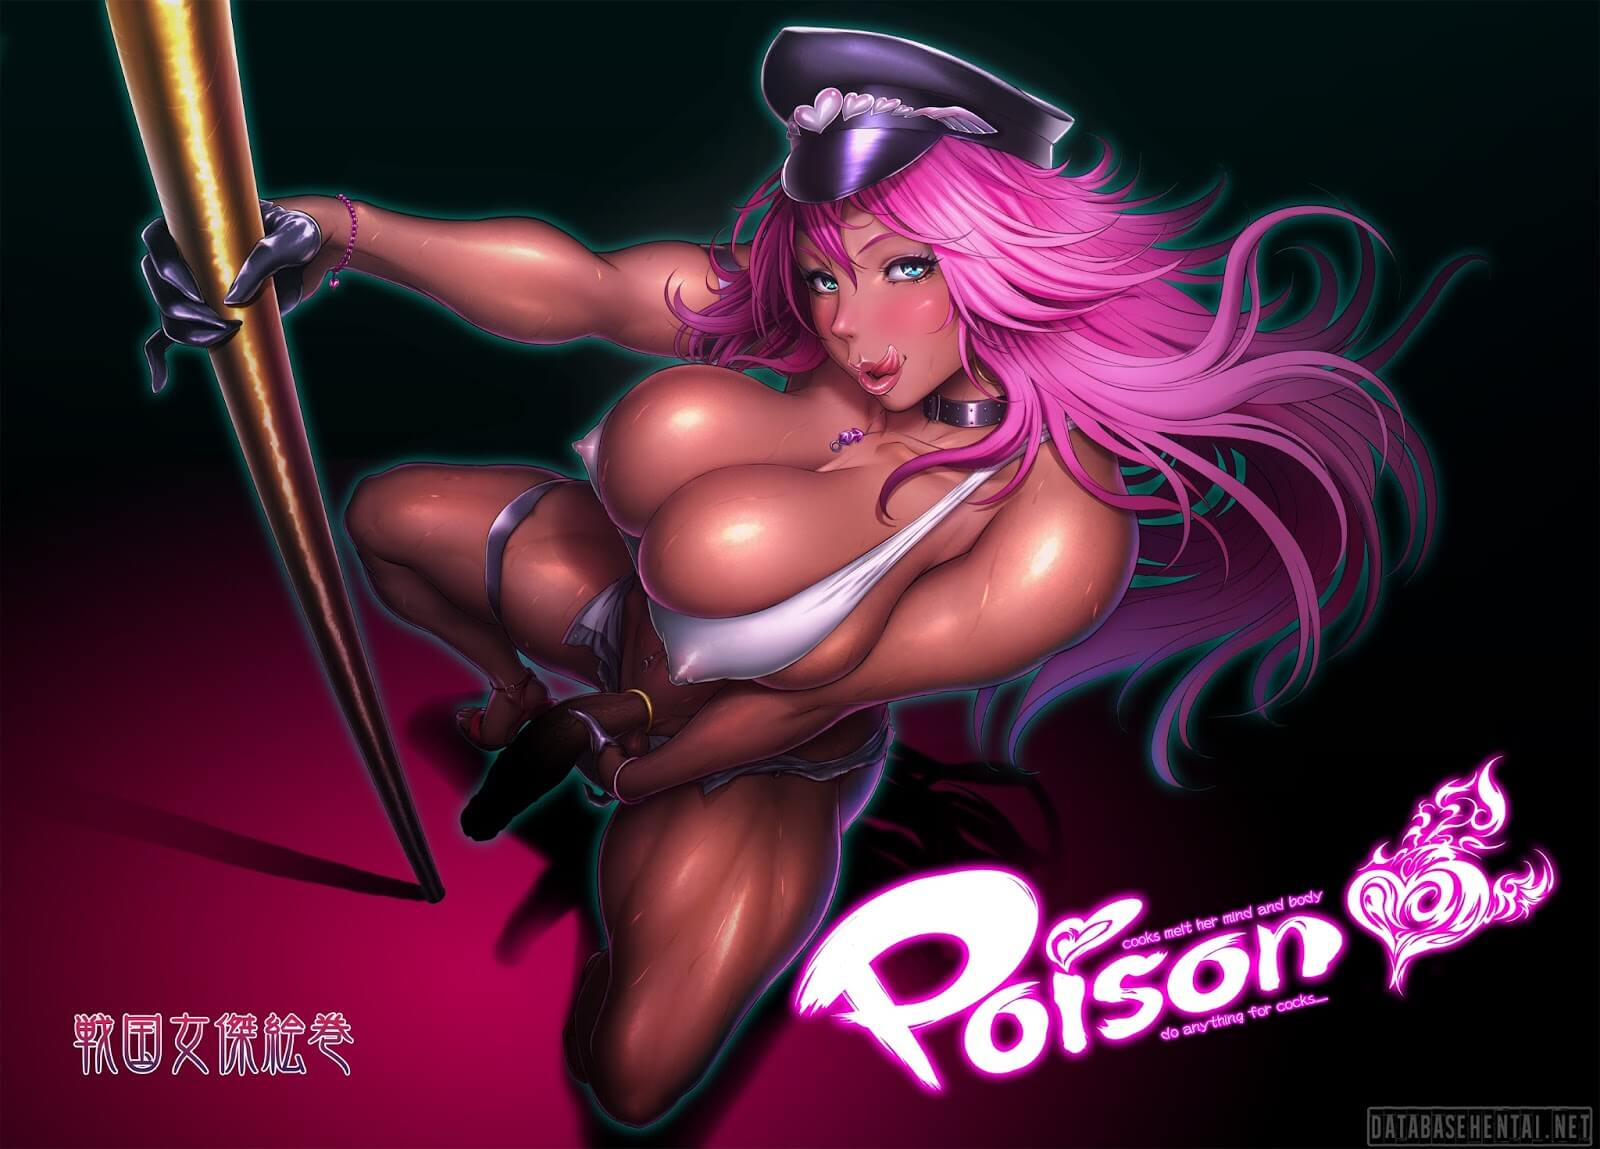 Street Fighter Hentai